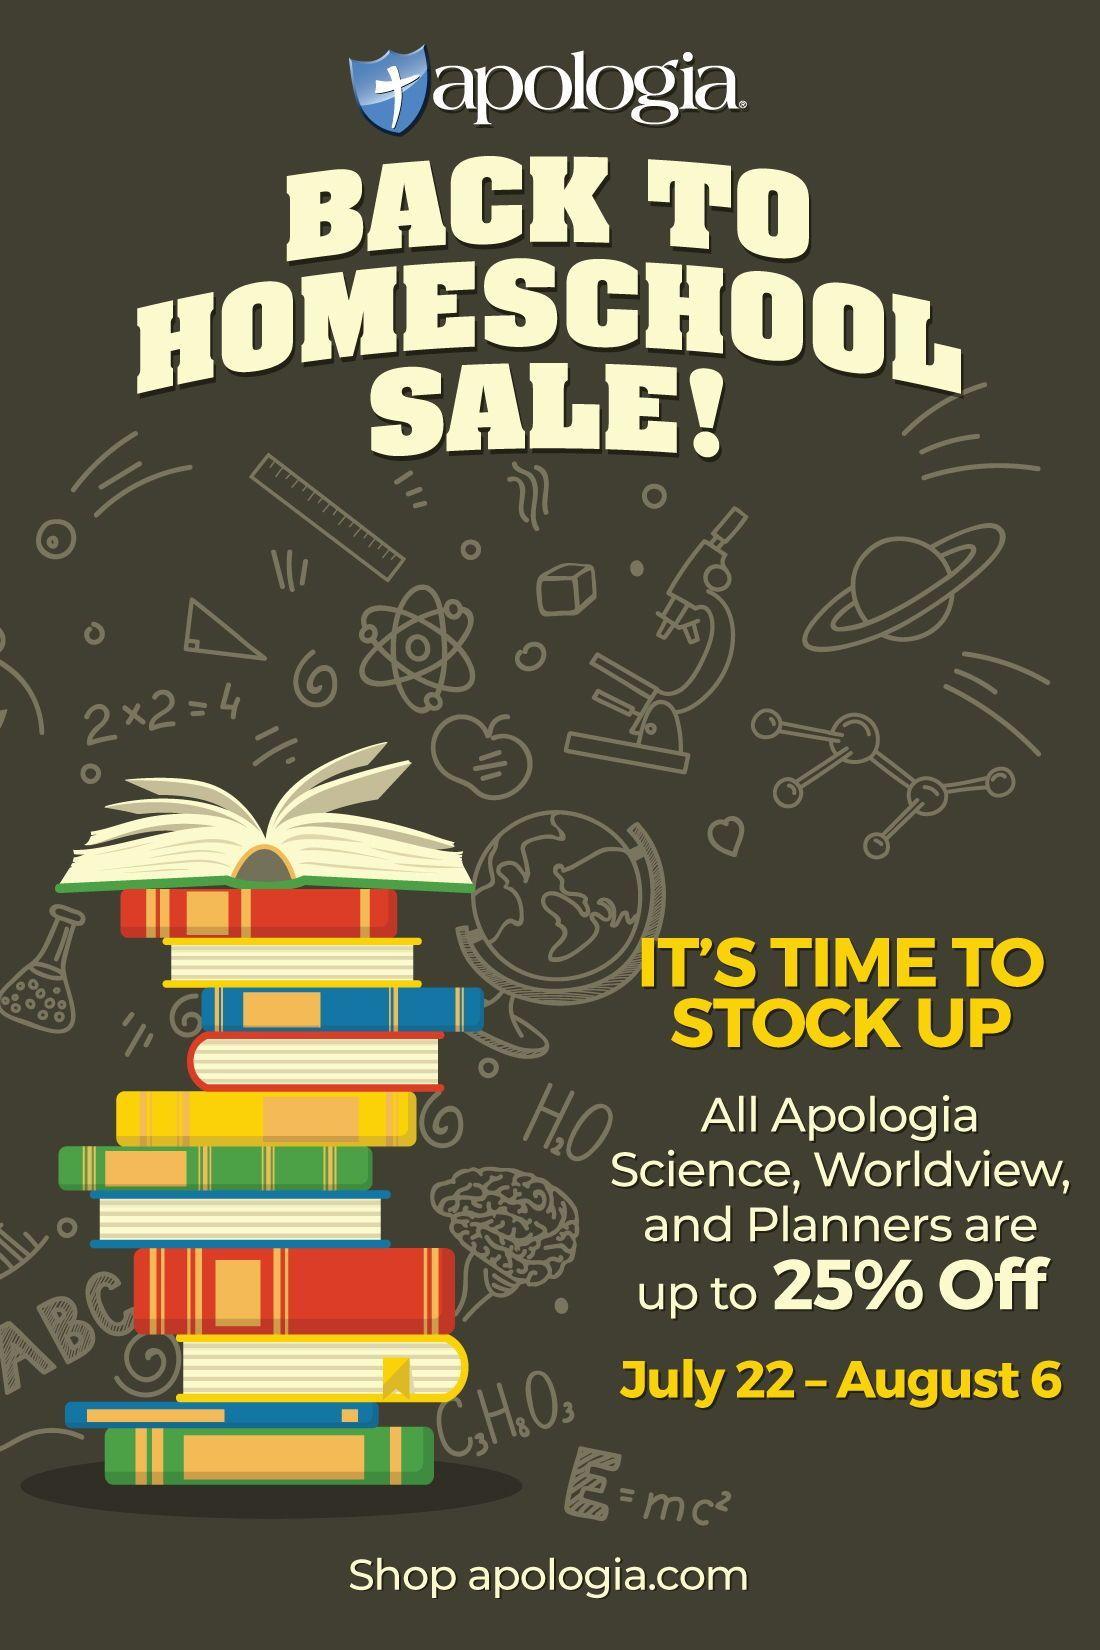 Apologia An awardwinning publisher of homeschool